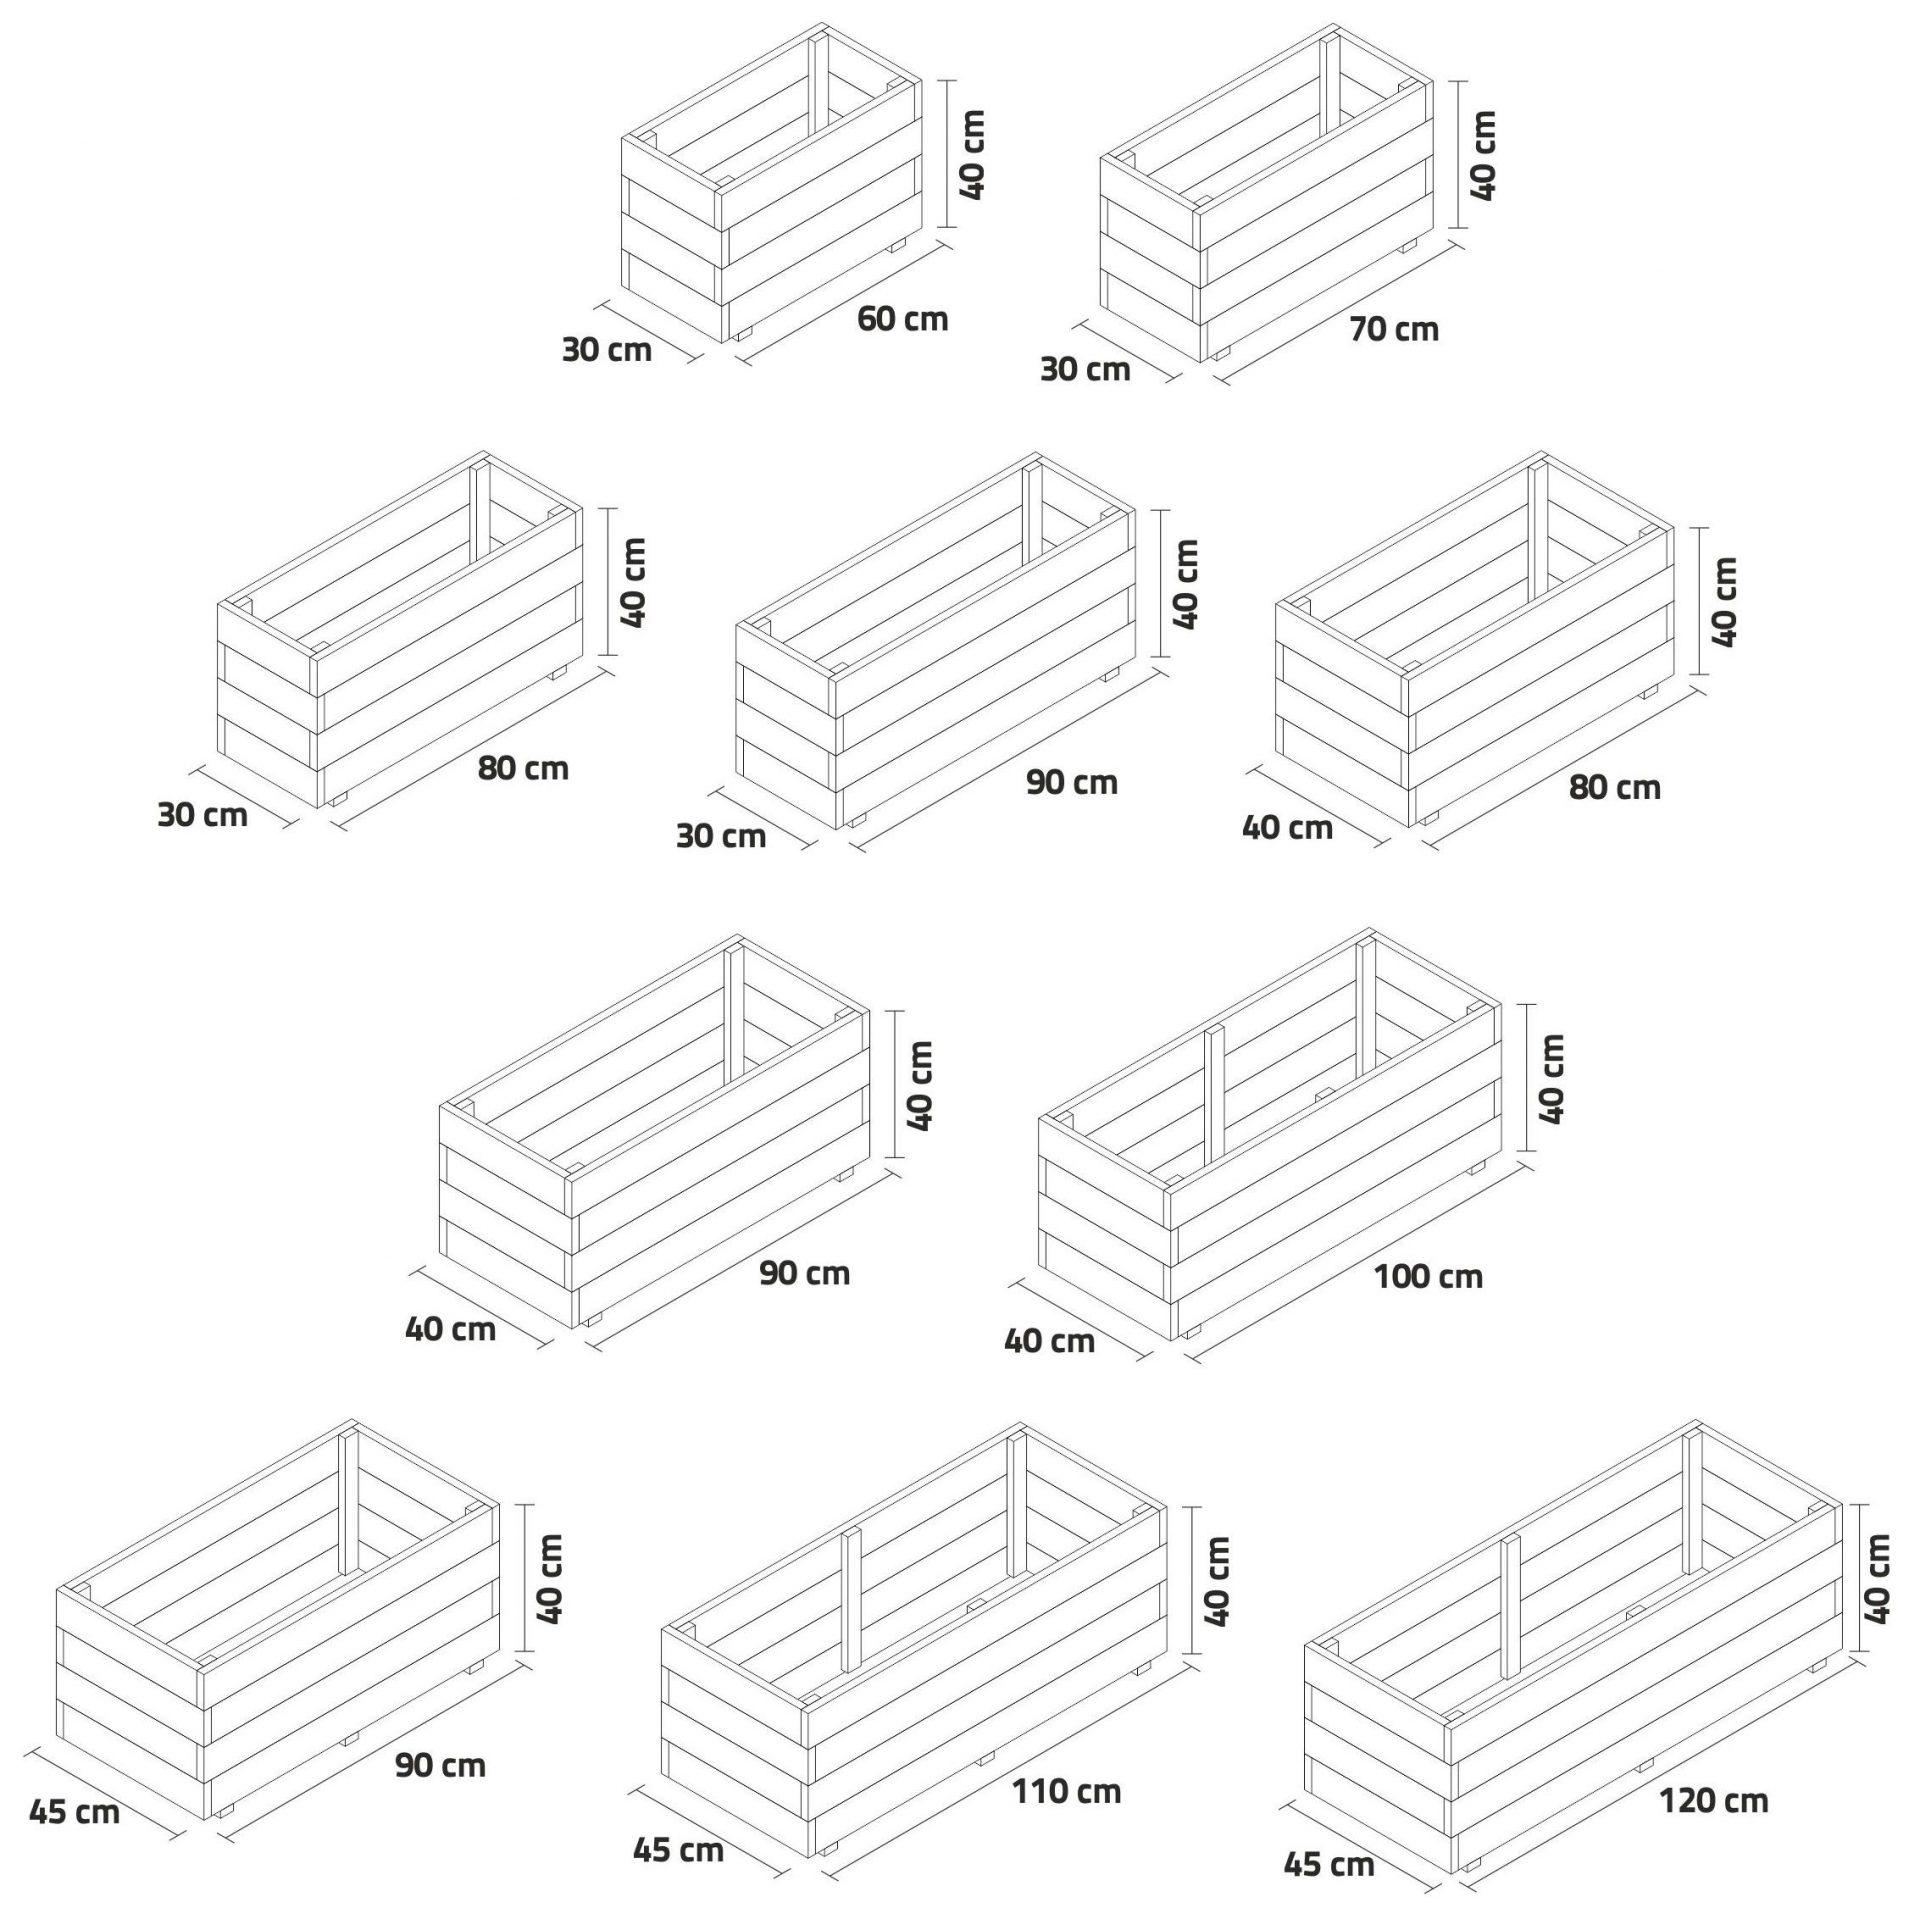 Dimensiones jardinera de madera rectangular